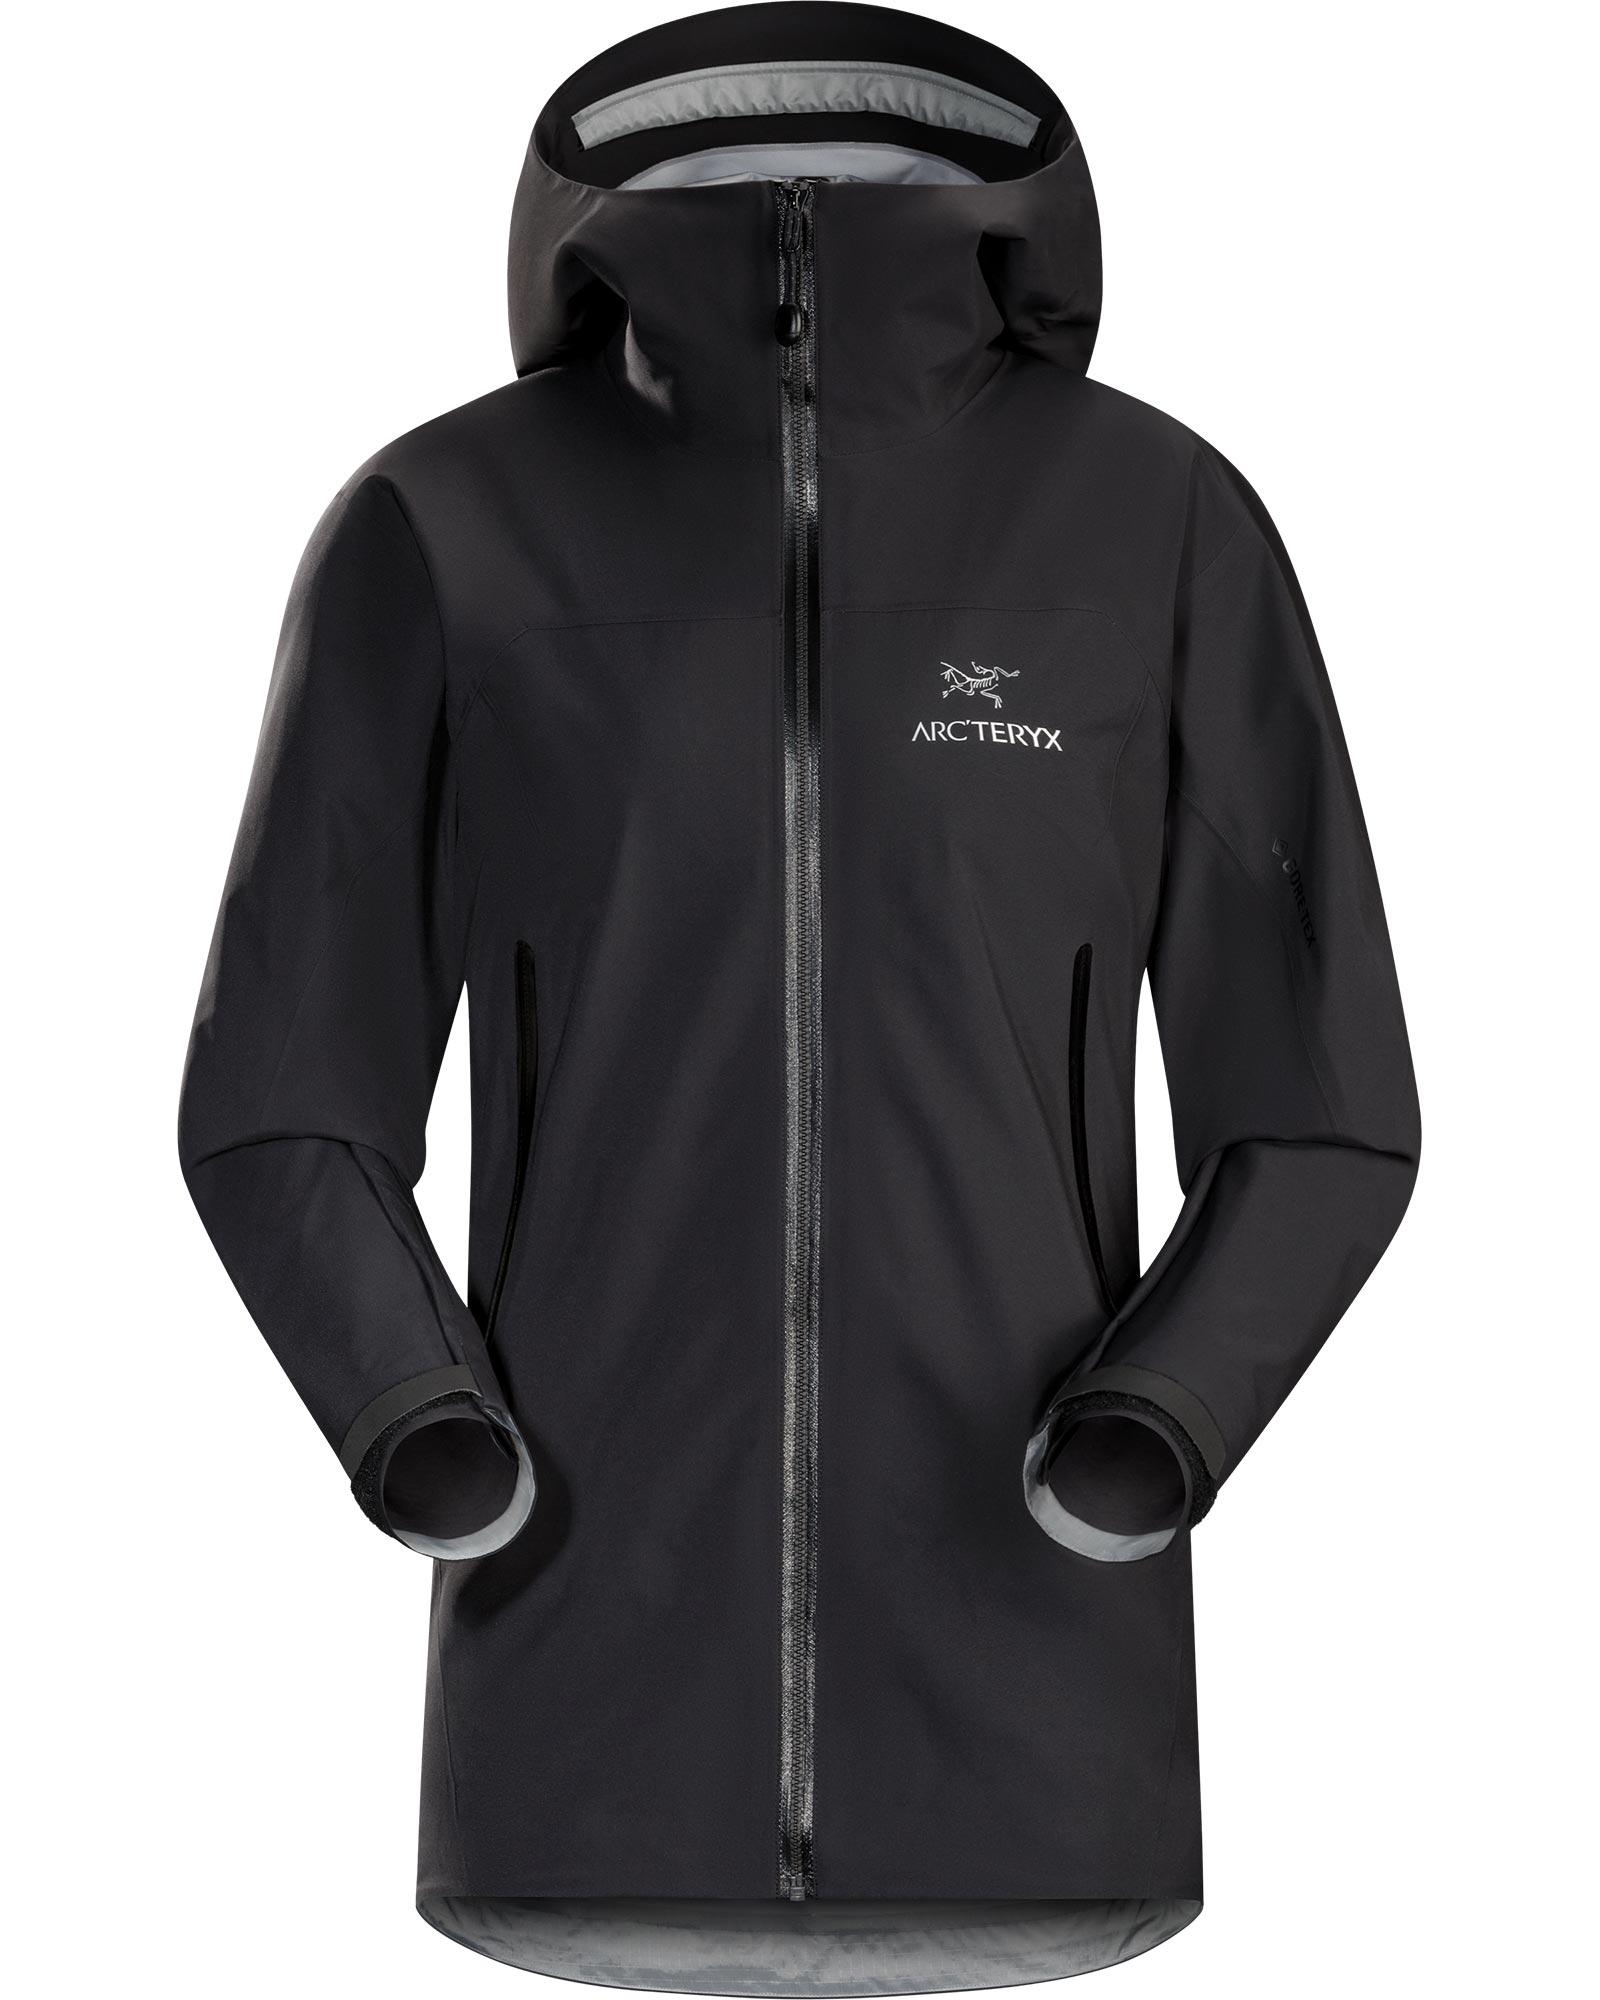 Arc'teryx Women's Zeta AR GORE-TEX Waterproof Jacket 0